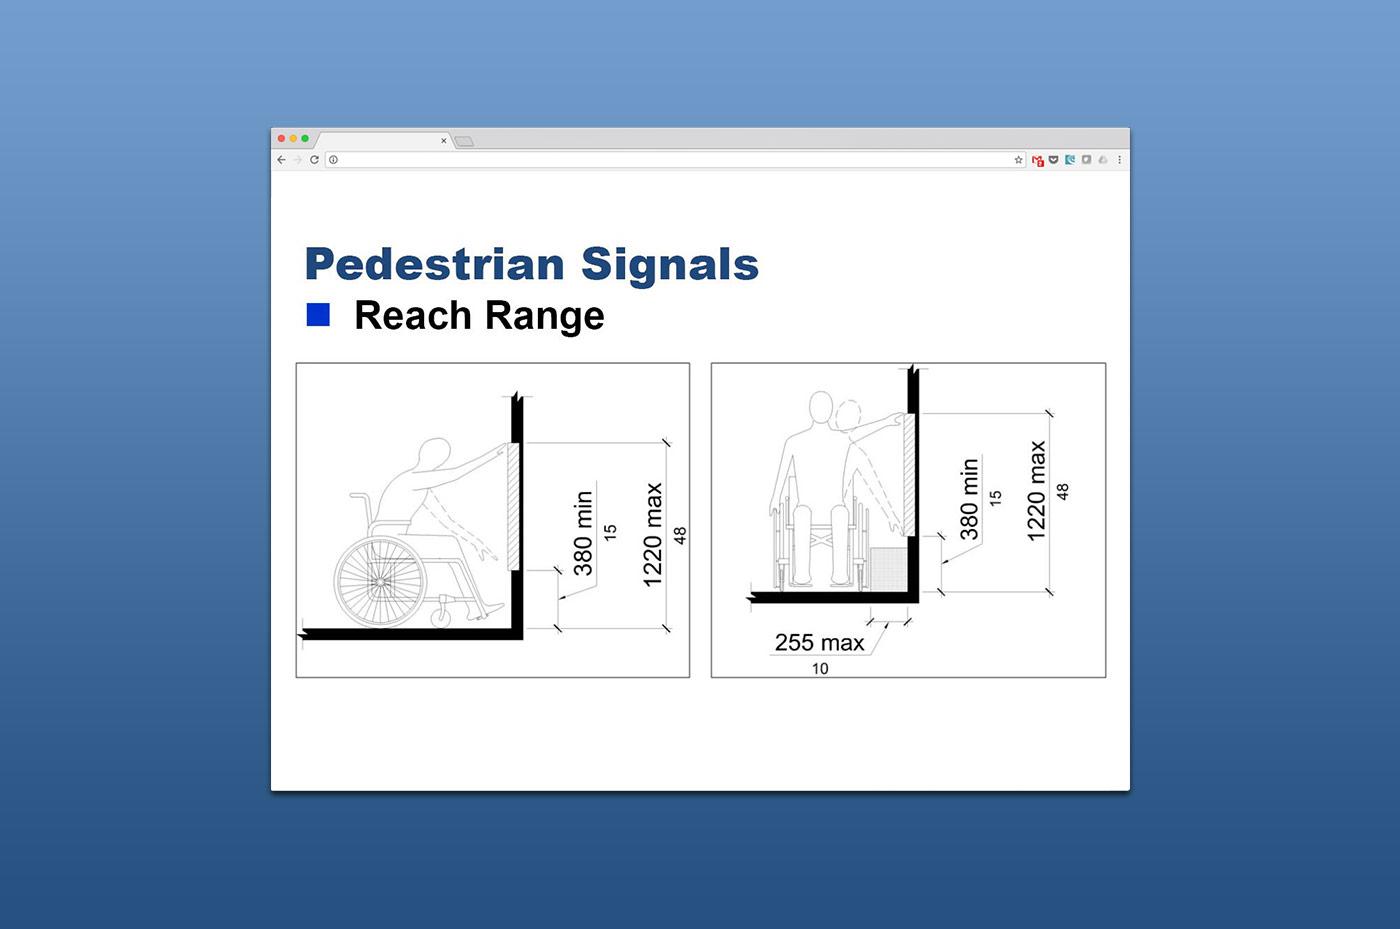 Webinars - Pedestrian Signals slide